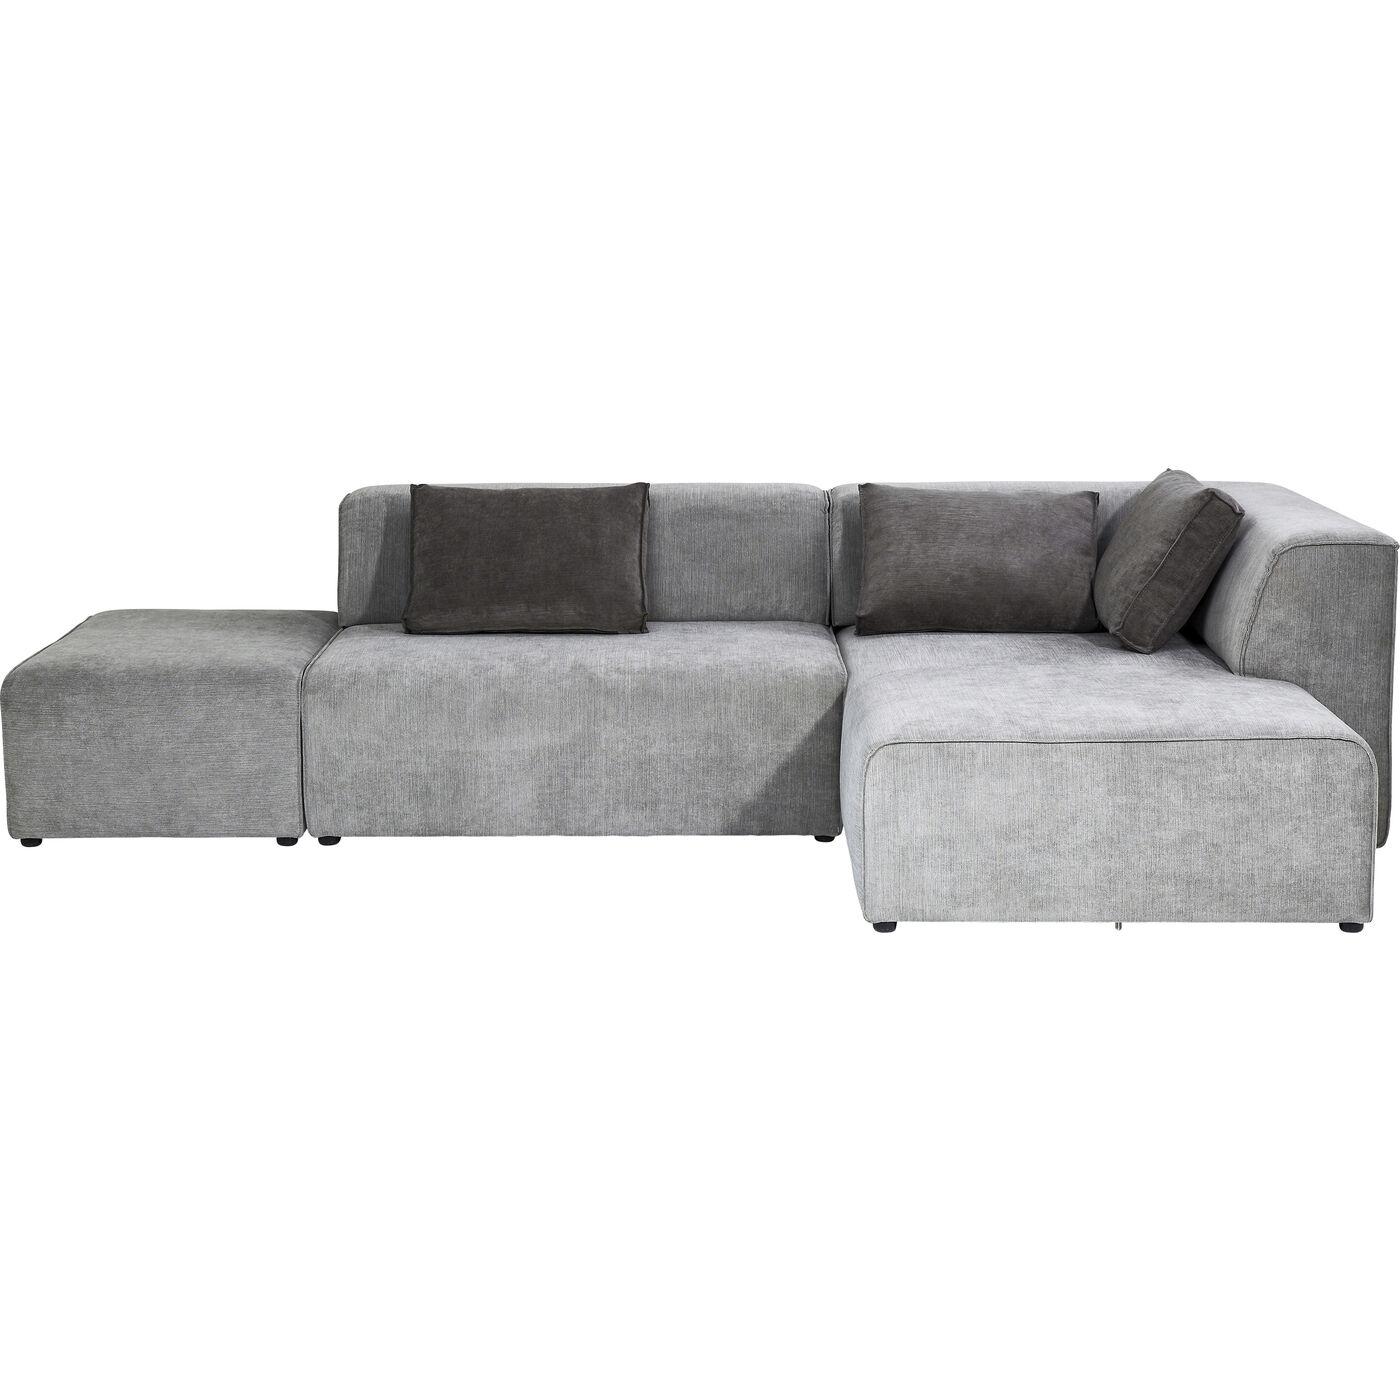 Sofa Infinity Ottomane Grau Rechts